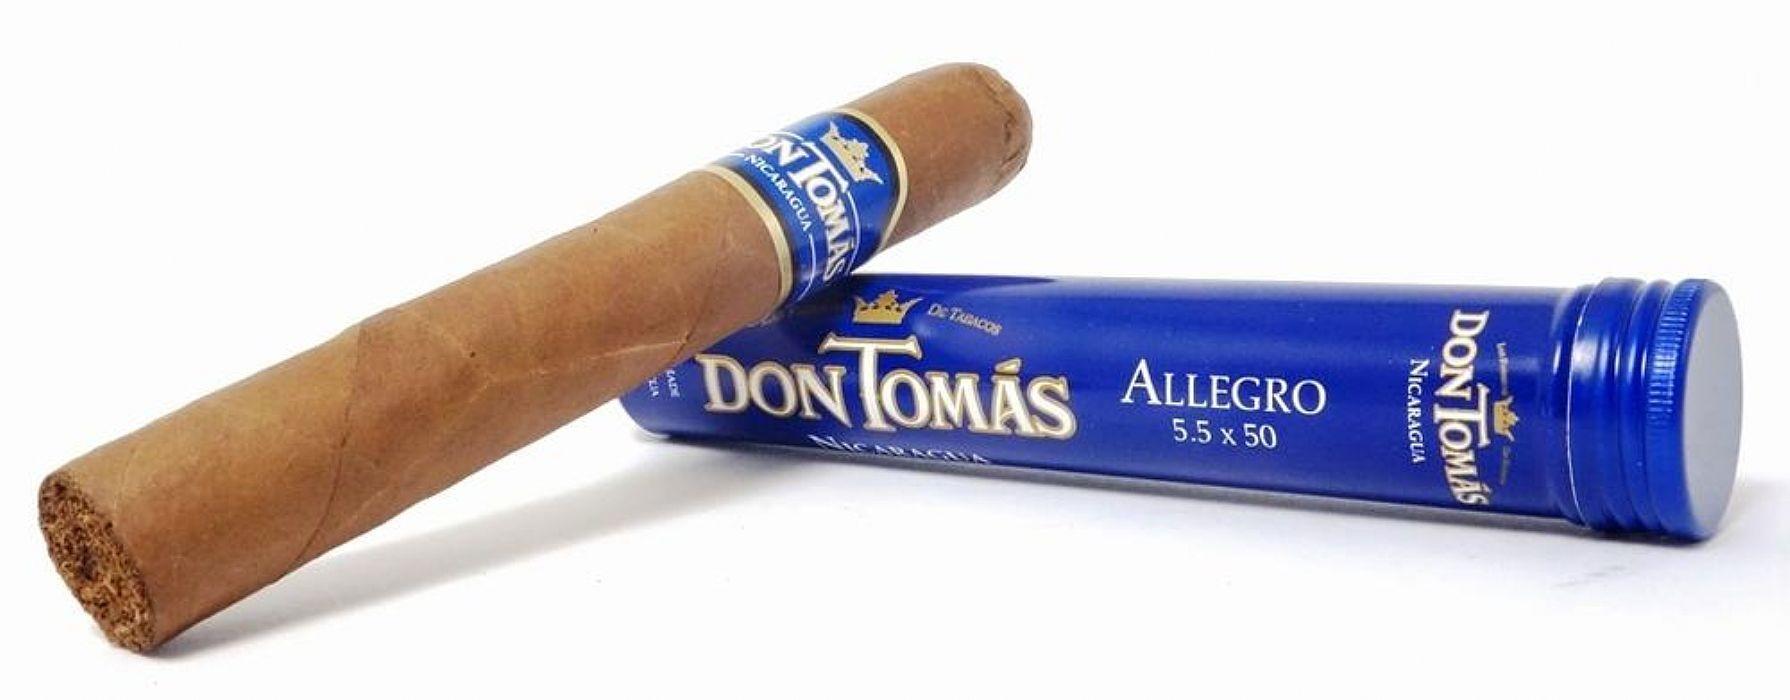 Don Tomas Nicaragua Allegro Tubos (Blue)